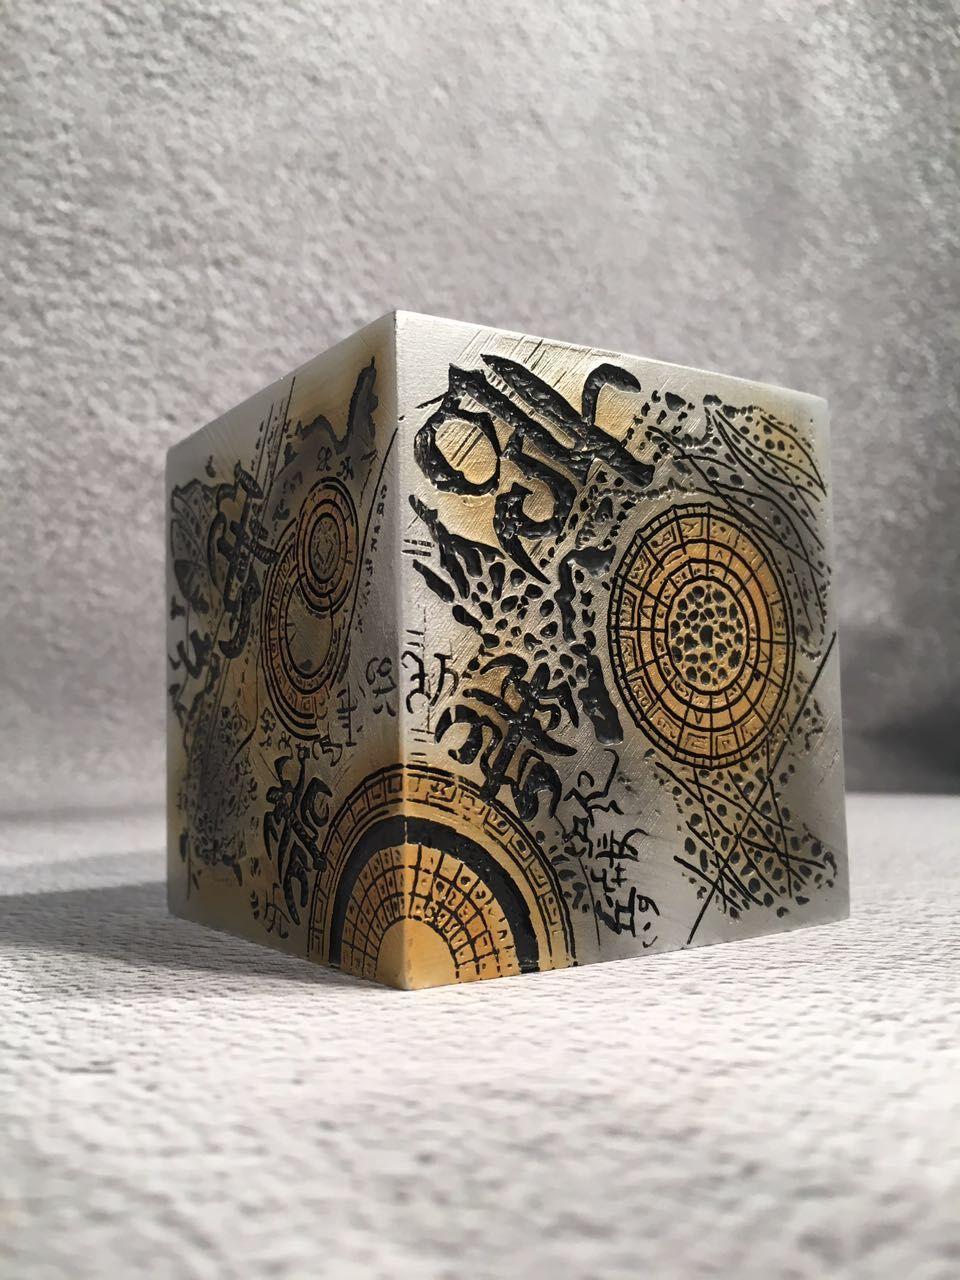 Transformation Allspark cube energie block Prime energie matrix GK produkt Abbildung Modell